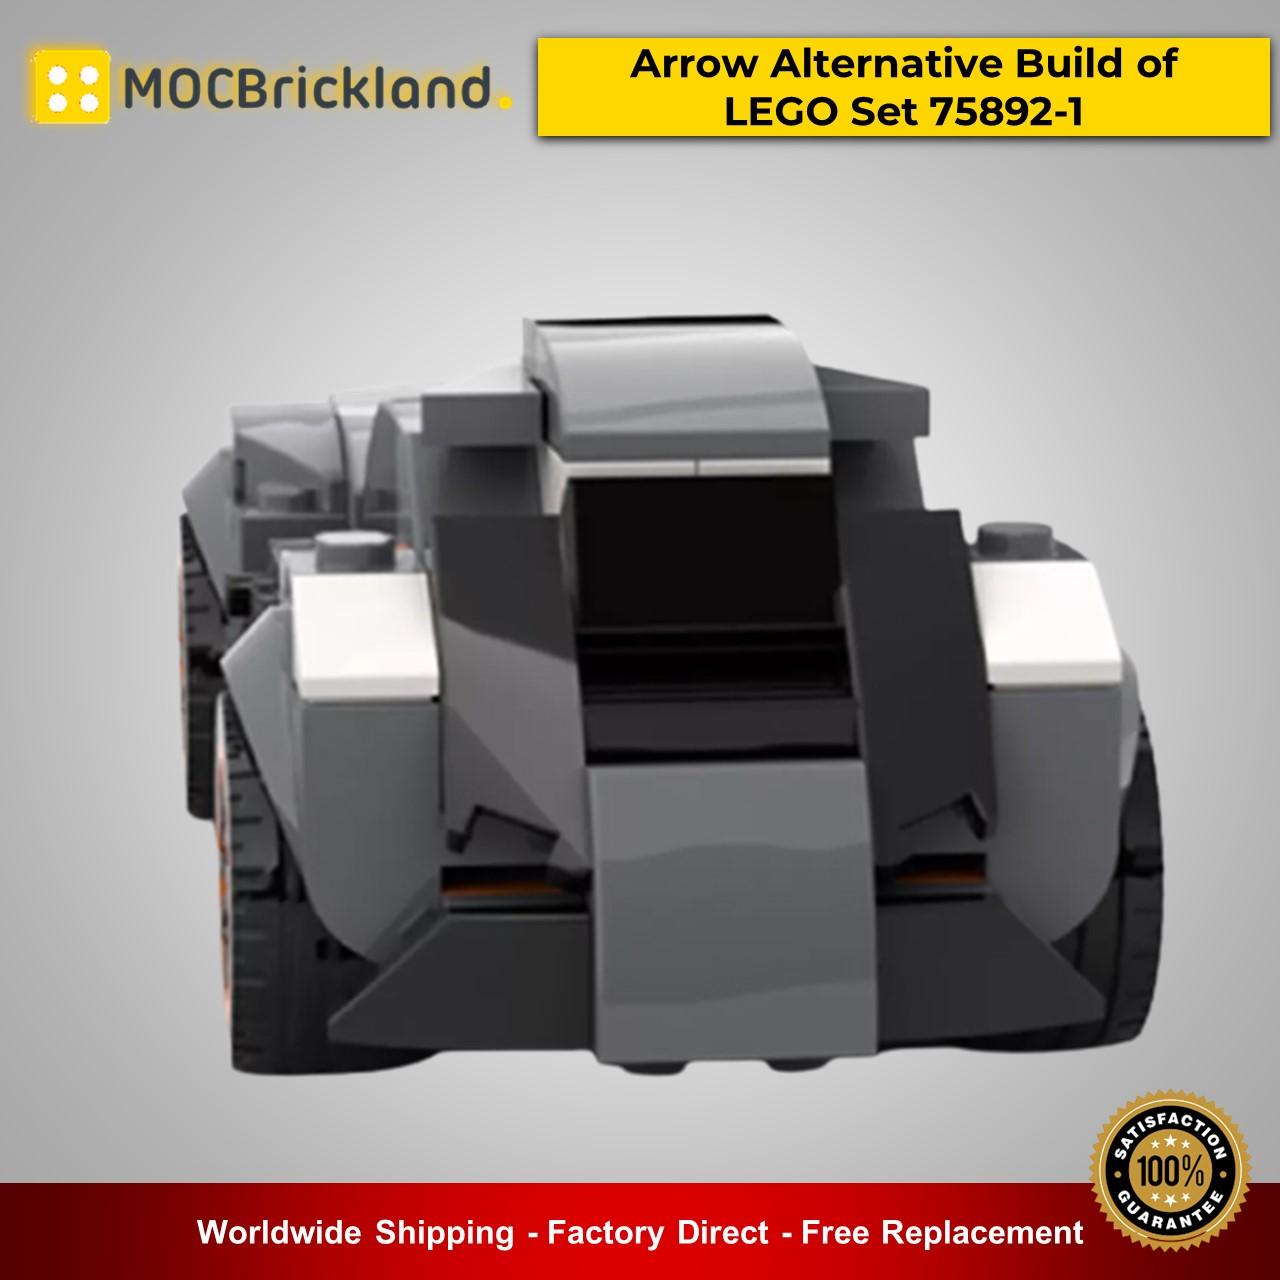 MOC-25814 Technic Arrow Alternative Build of LEGO Set 75892-1 By Lego Dark Side With 125 Pieces